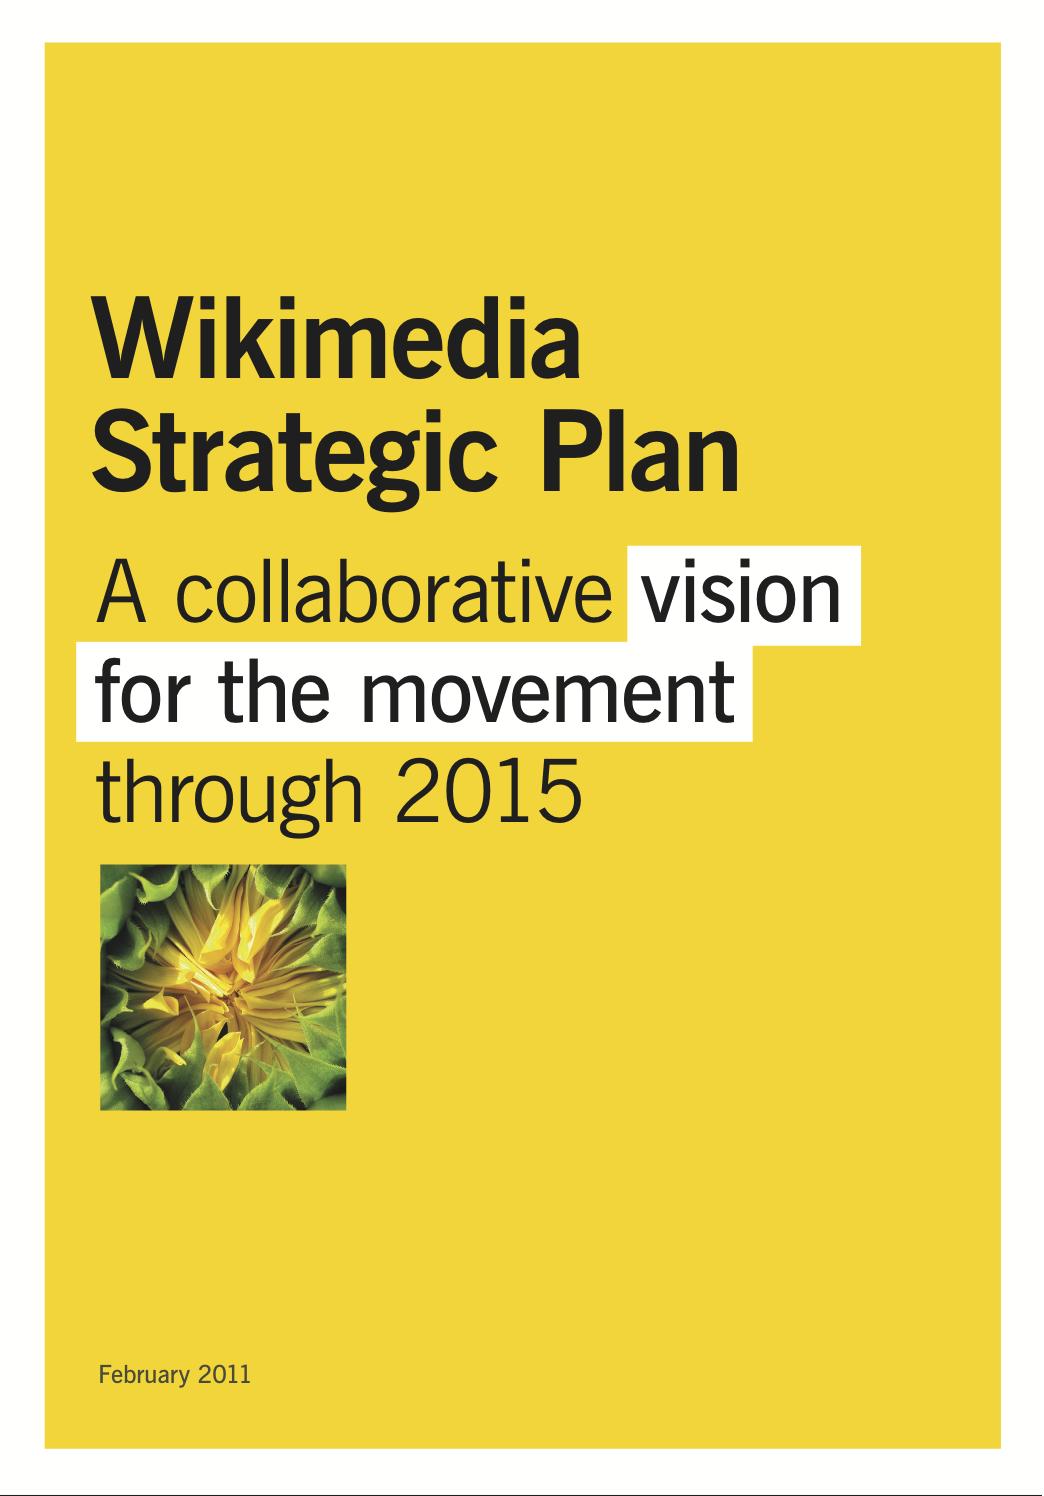 Wikimedia strategic plan